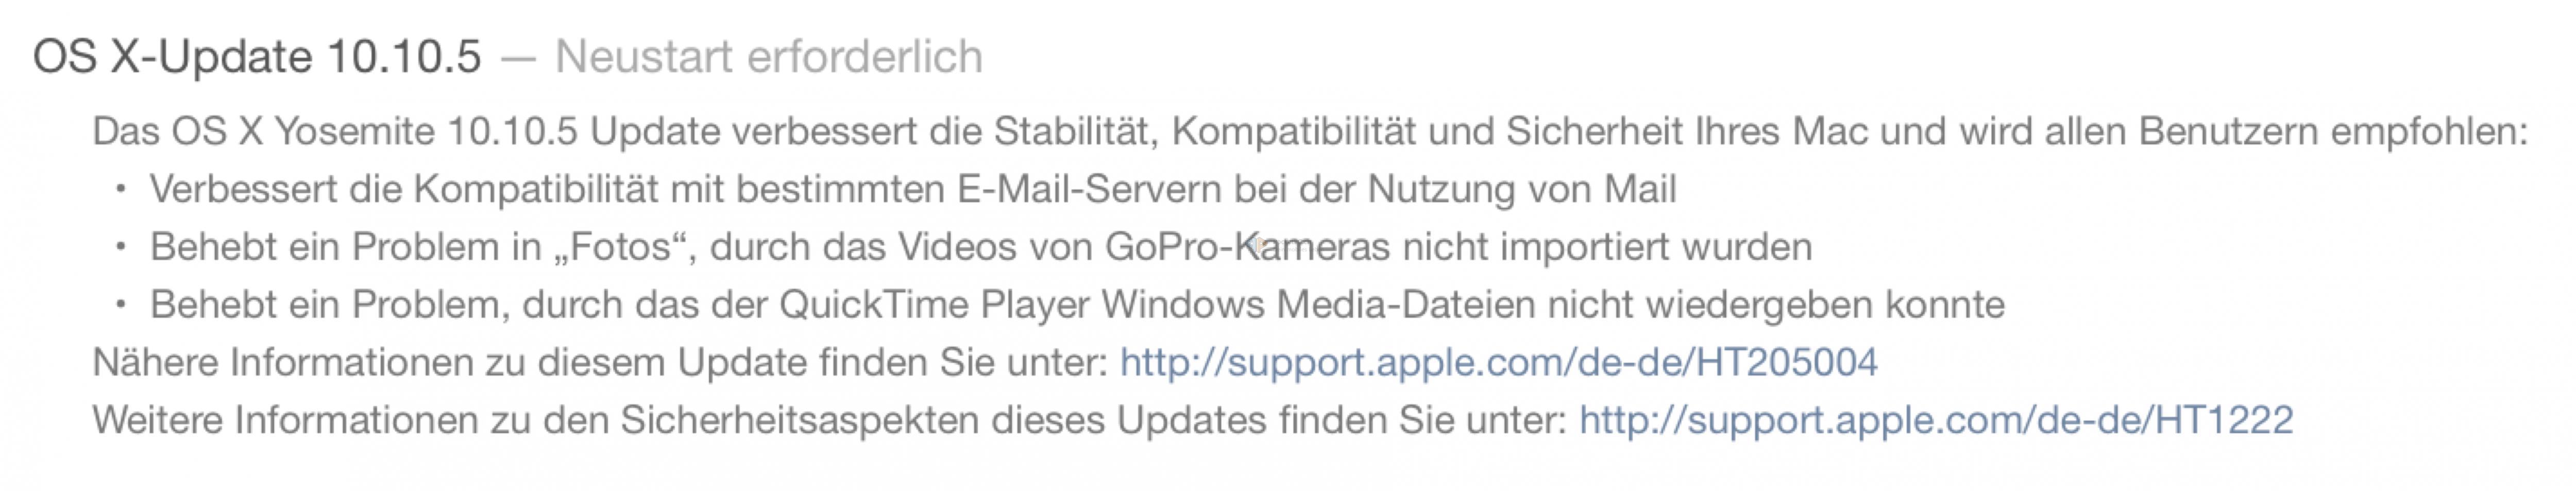 macOS Update Topic-bild-1.jpg